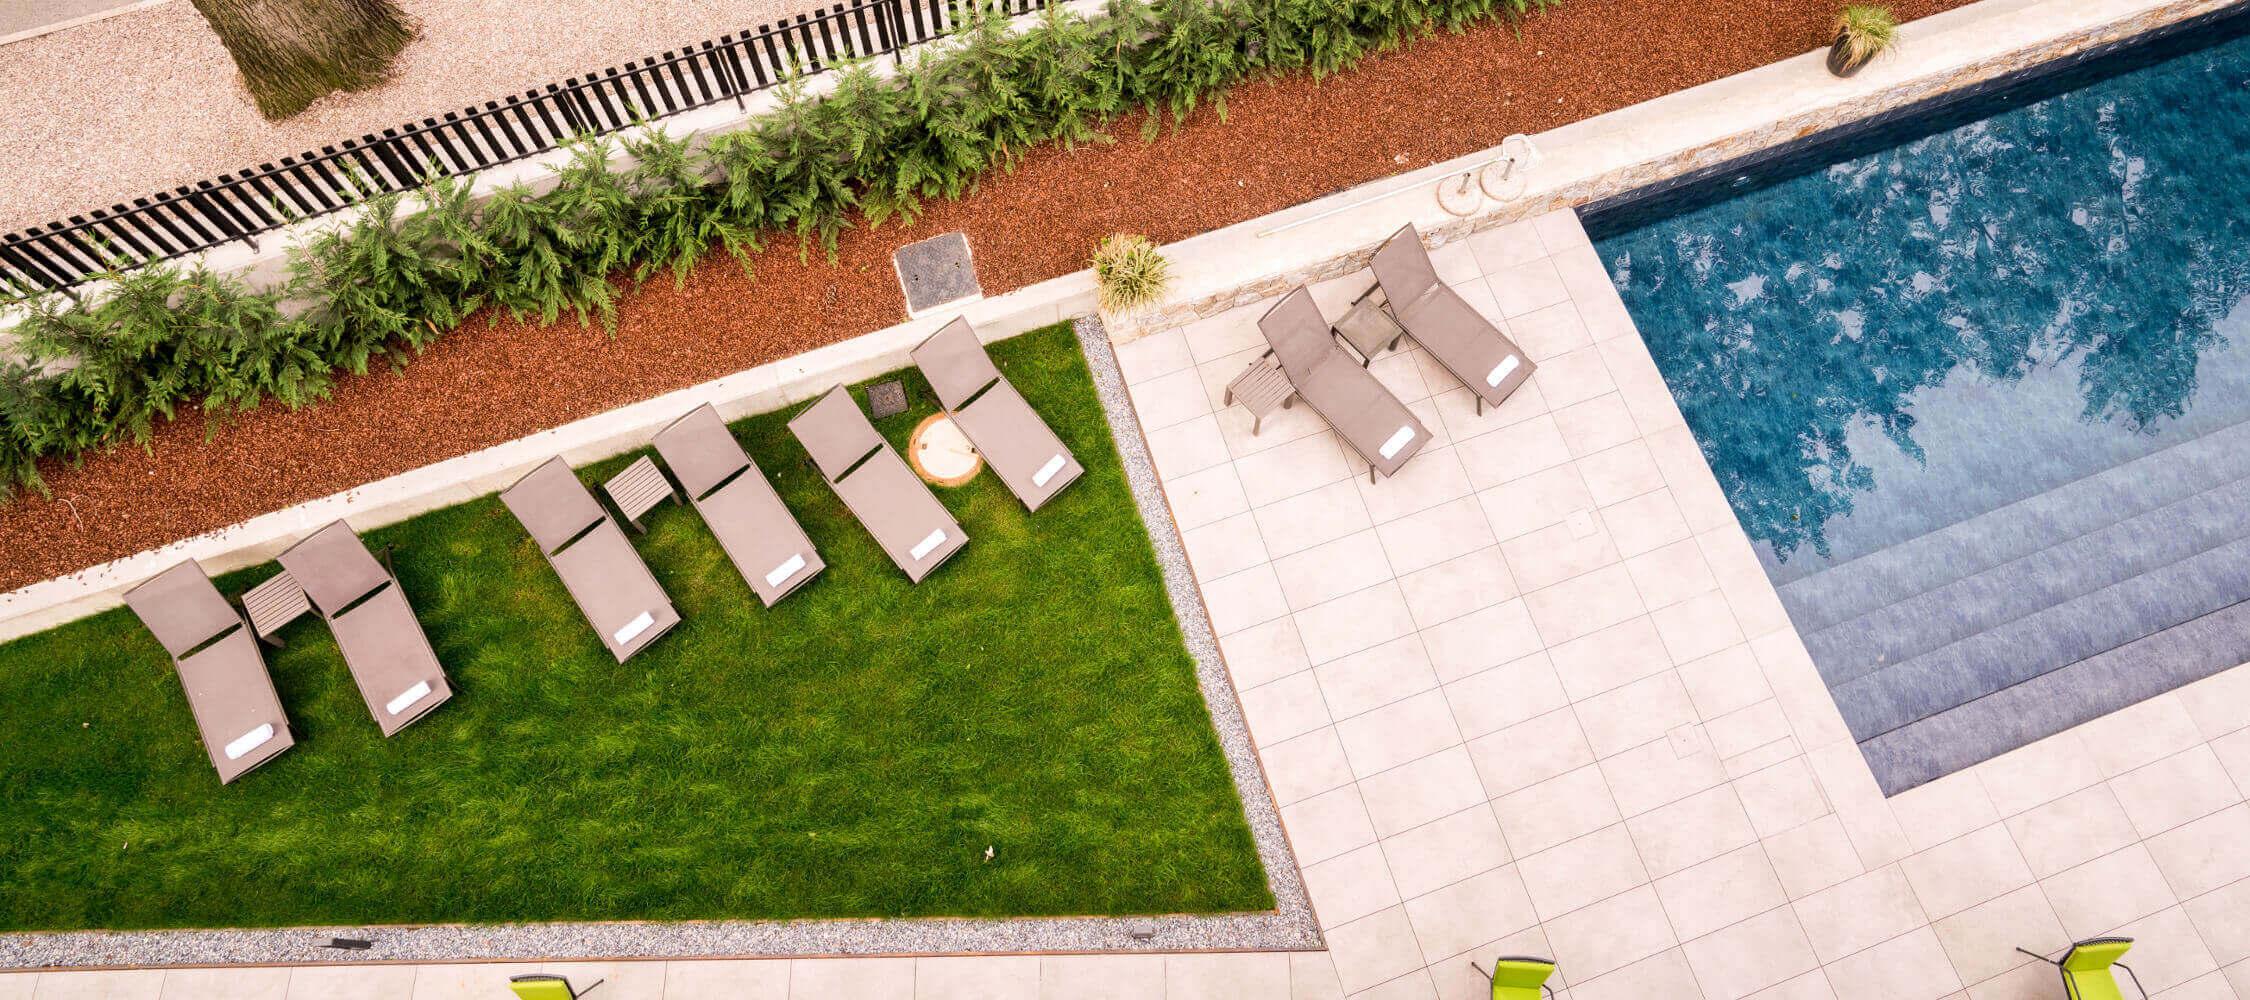 Hotel_Flora_Merano_Wellness_Garten_Freischwimmbad_BeatricePilottoDSC03708_2250x1000